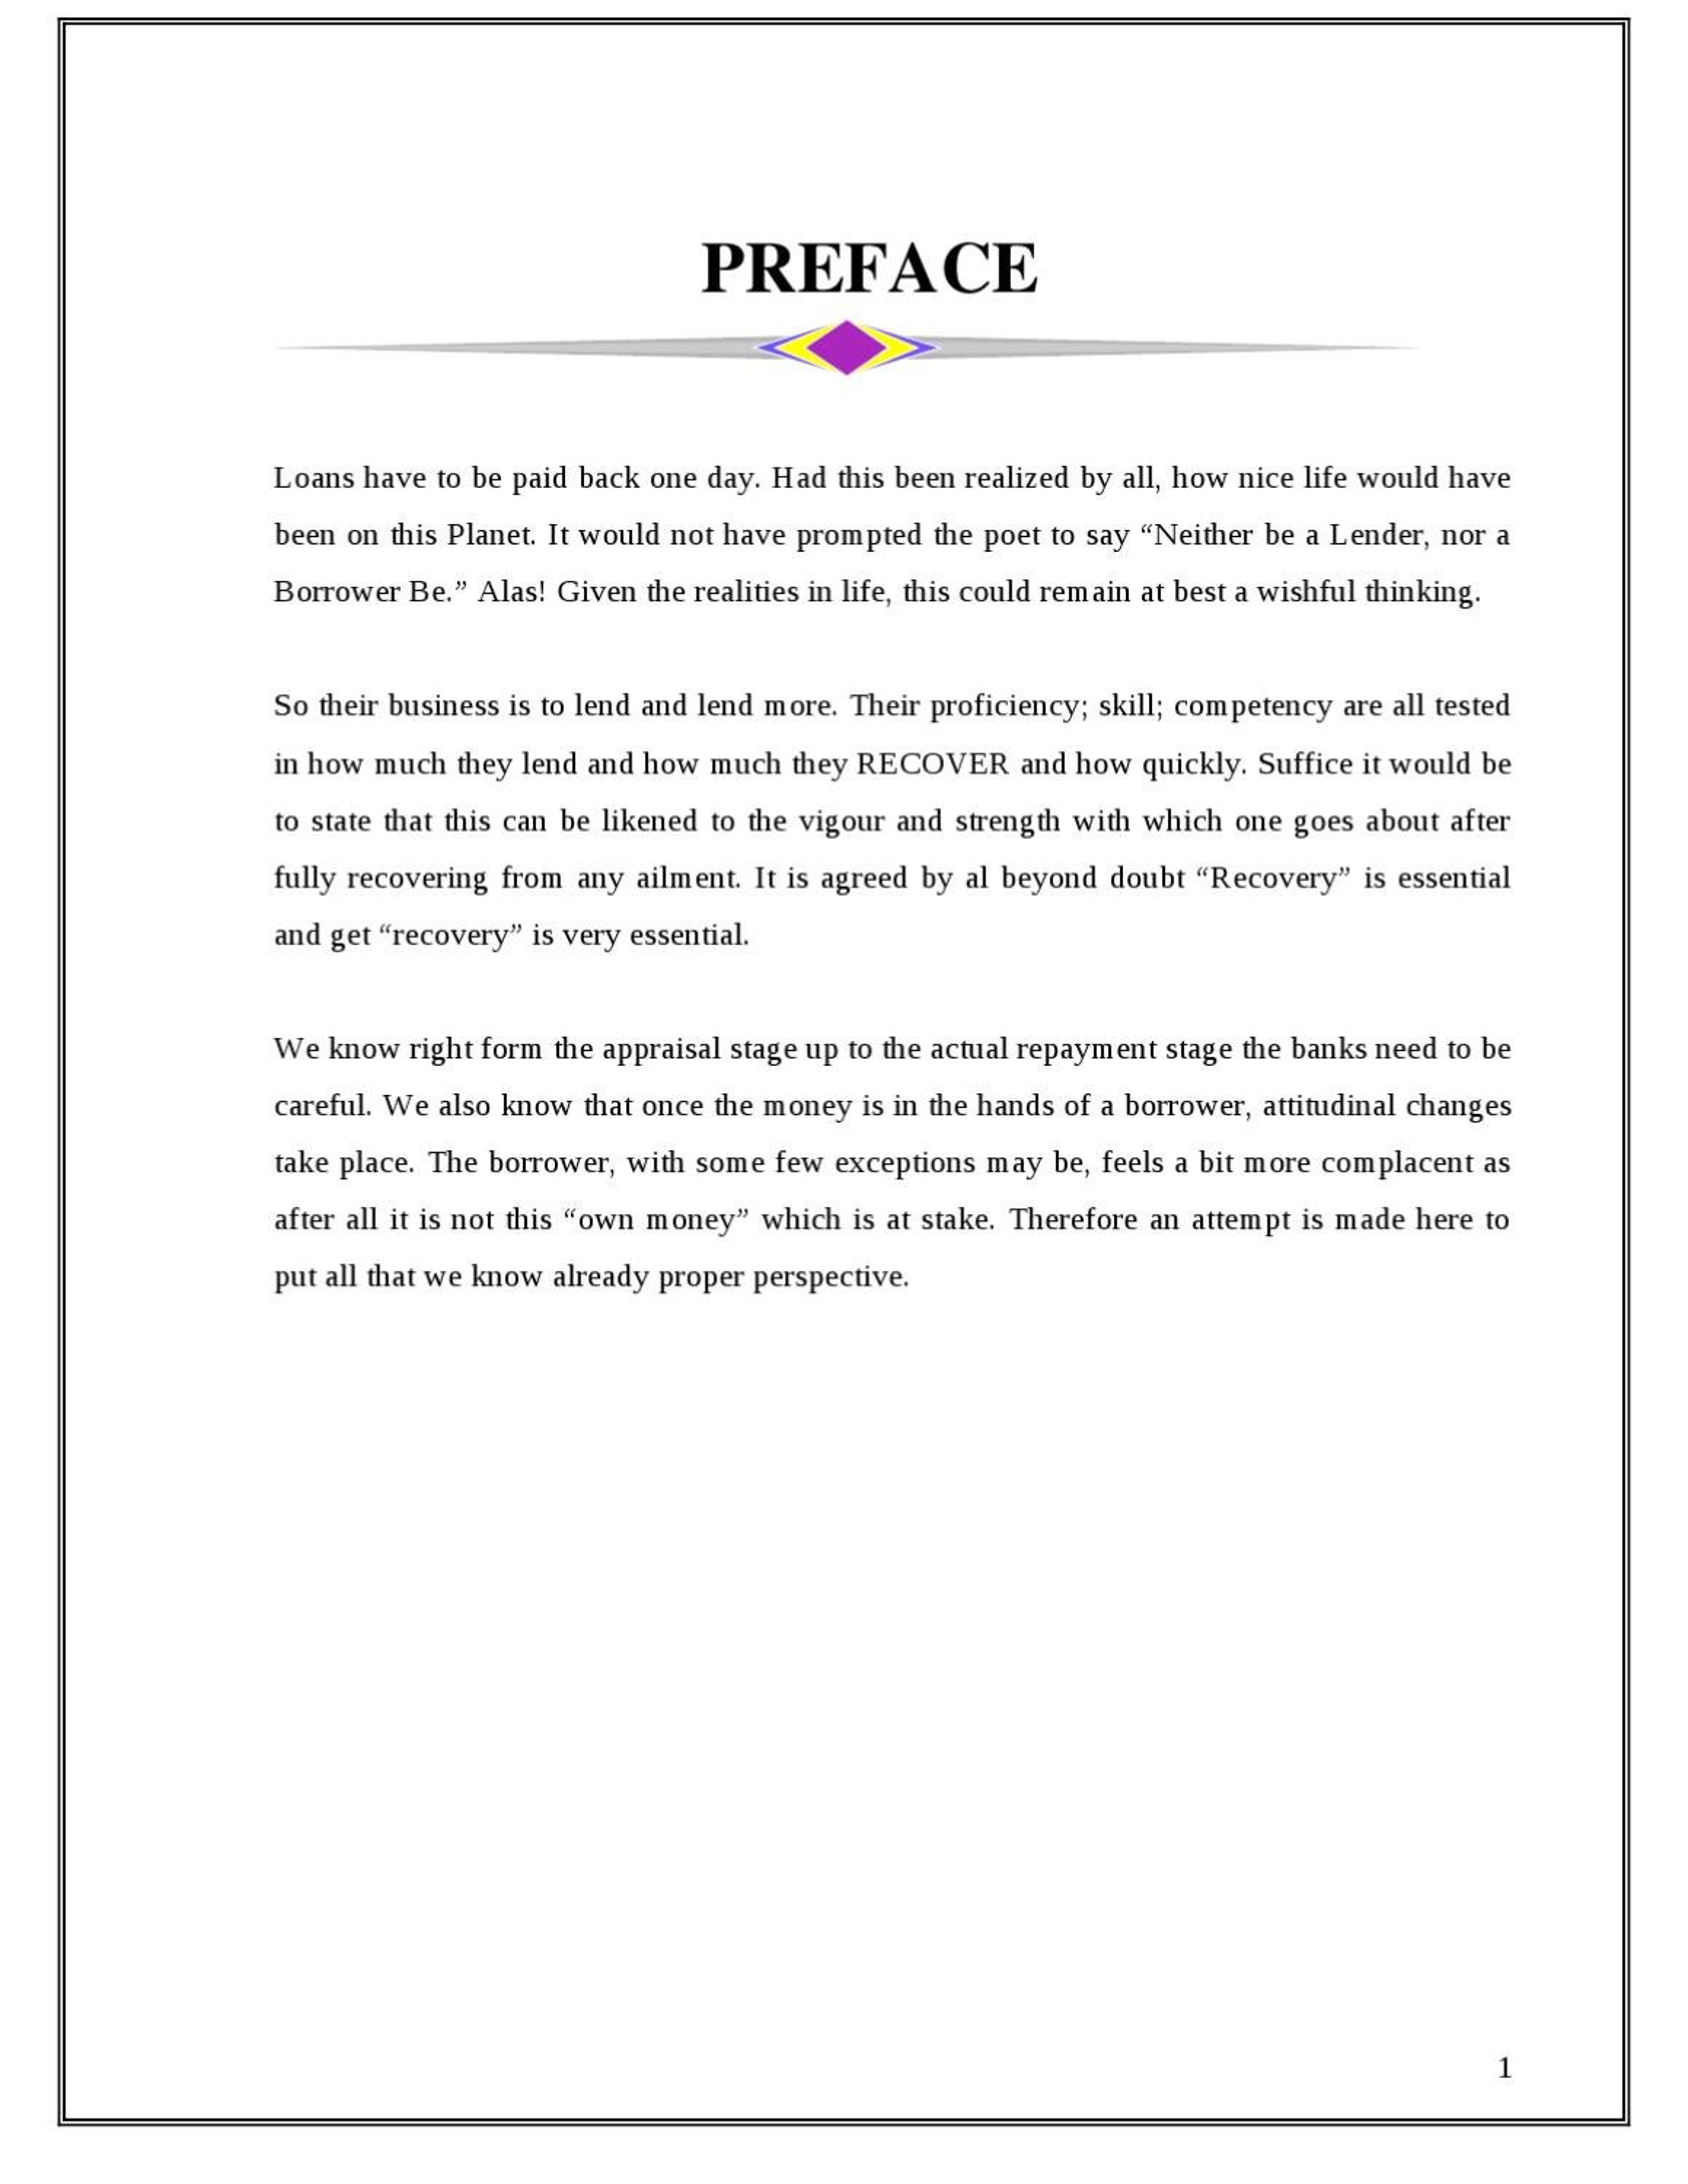 Cognos report studio pdf page break